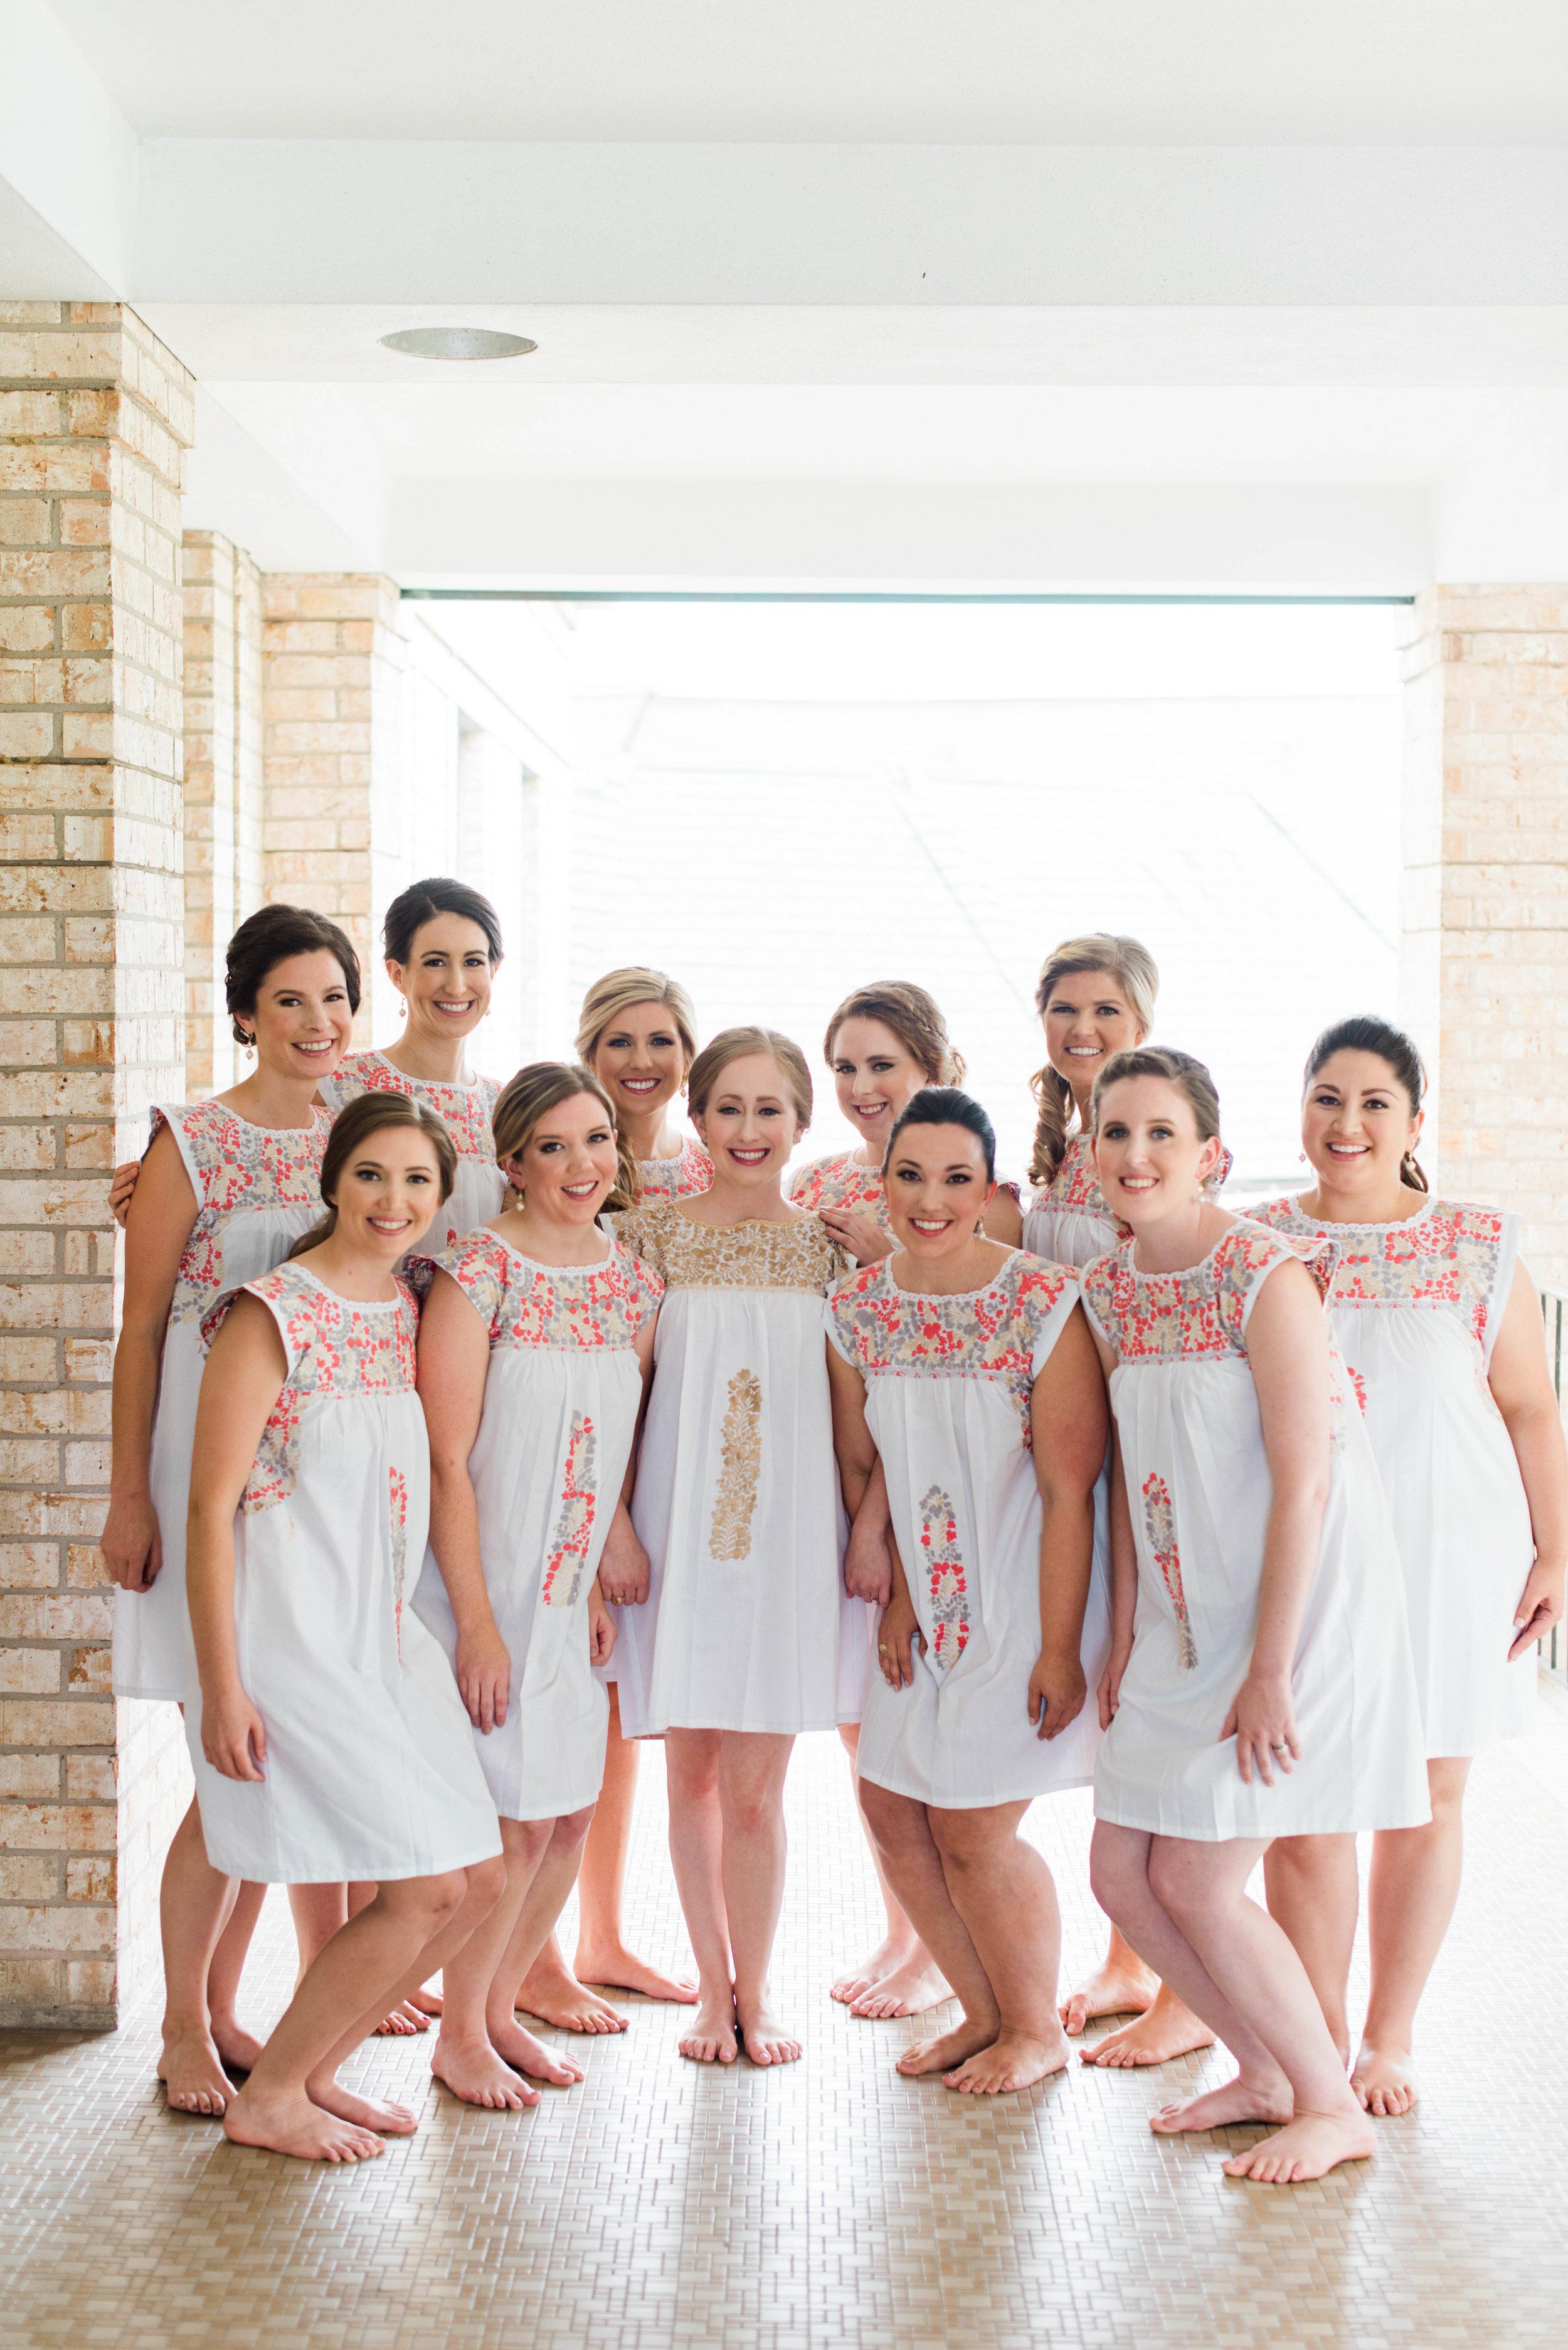 houston-wedding-planner-fine-art-luxury-designer-top-best-destination-austin-dallas-kelly-doonan-events-river-oaks-country-club-14